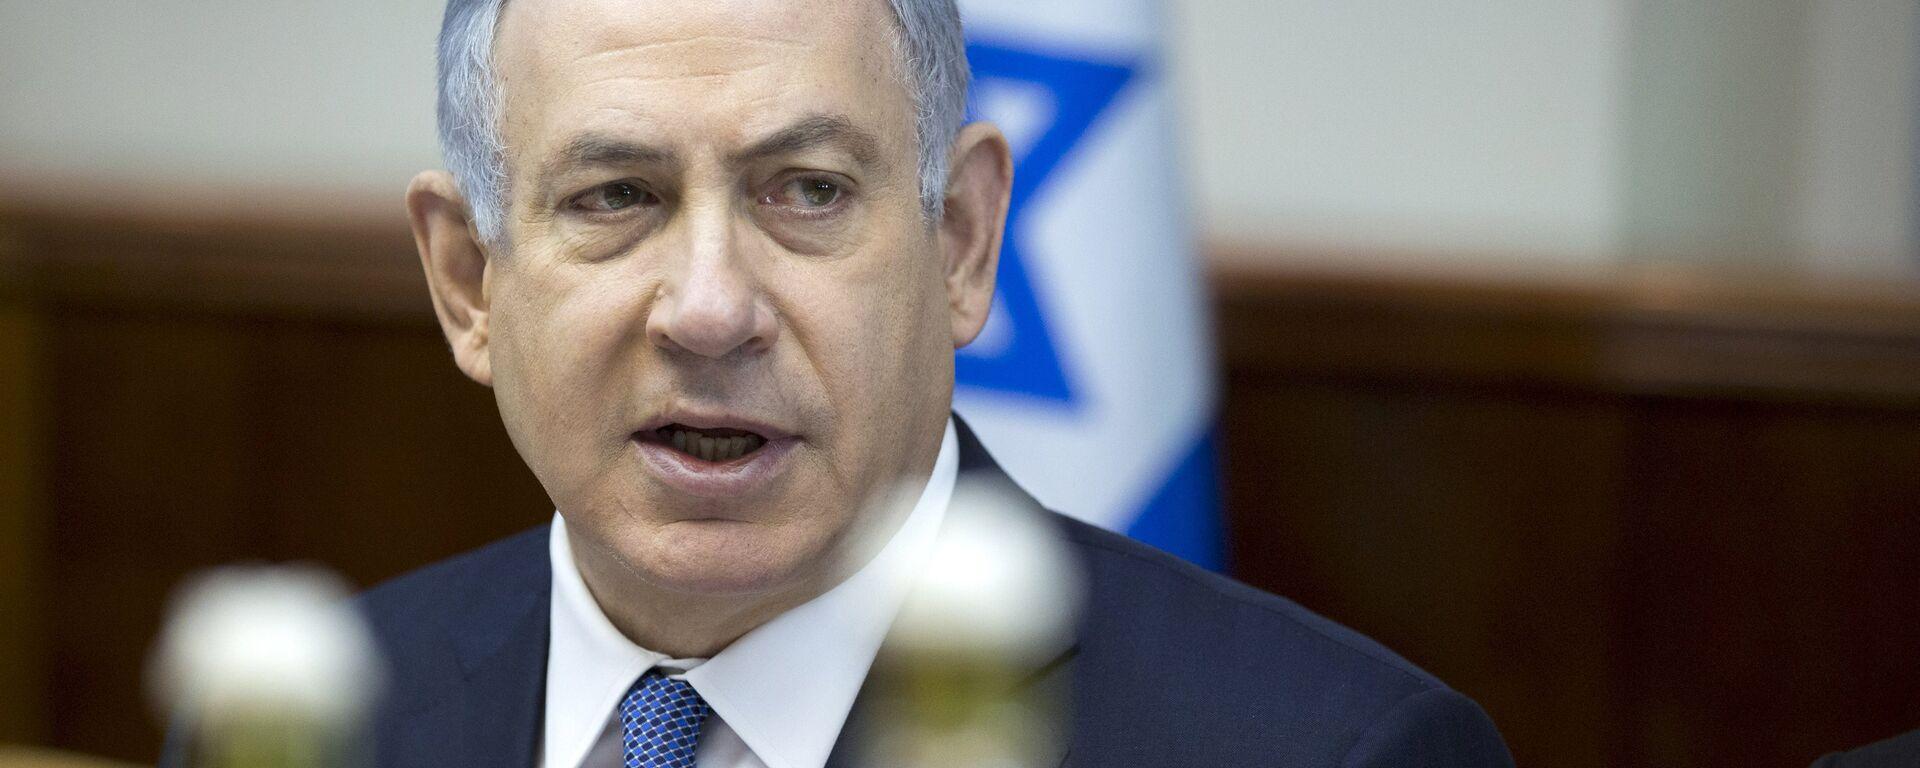 Benjamín Netanyahu, primer ministro de Israel - Sputnik Mundo, 1920, 13.04.2021